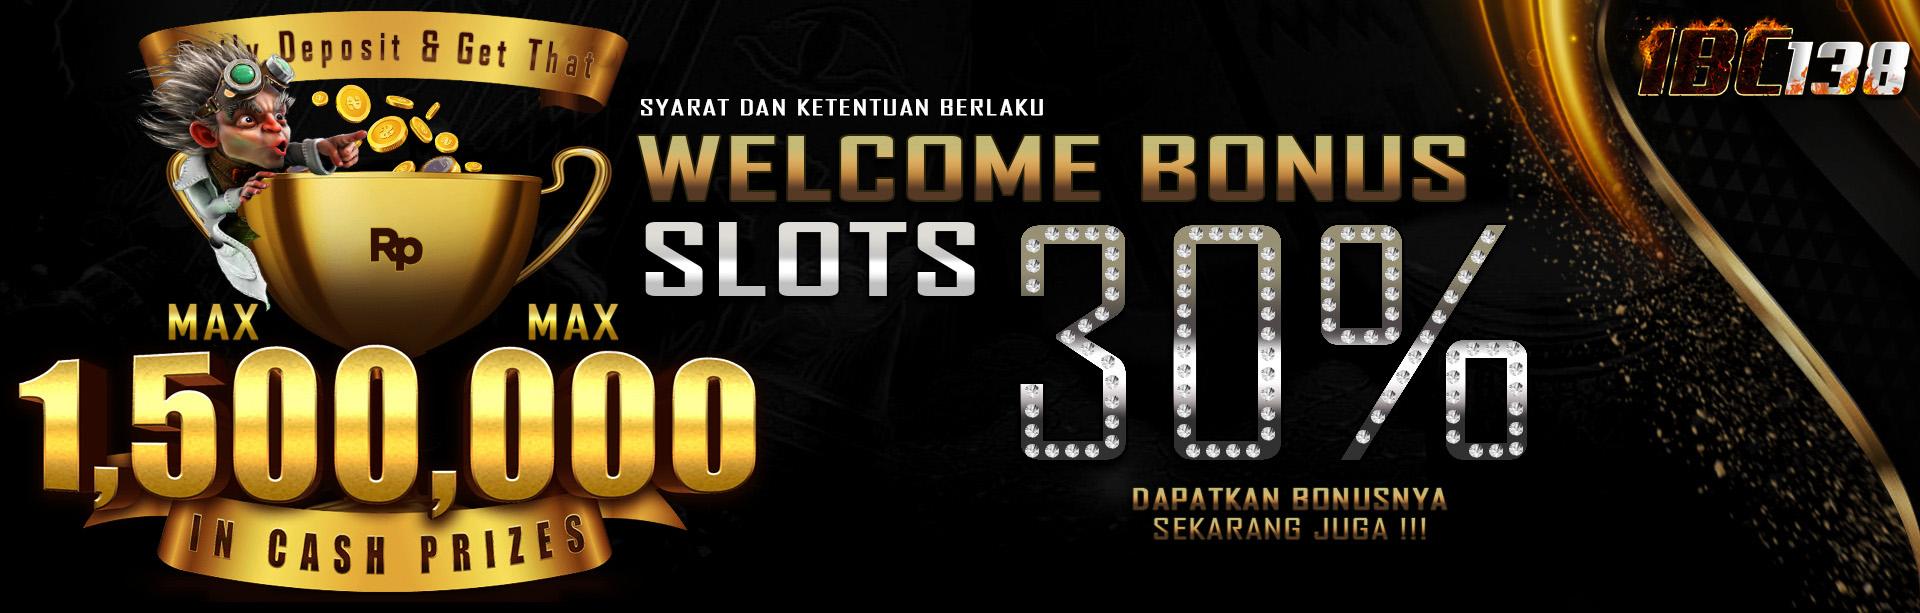 Welcome Bonus 30%